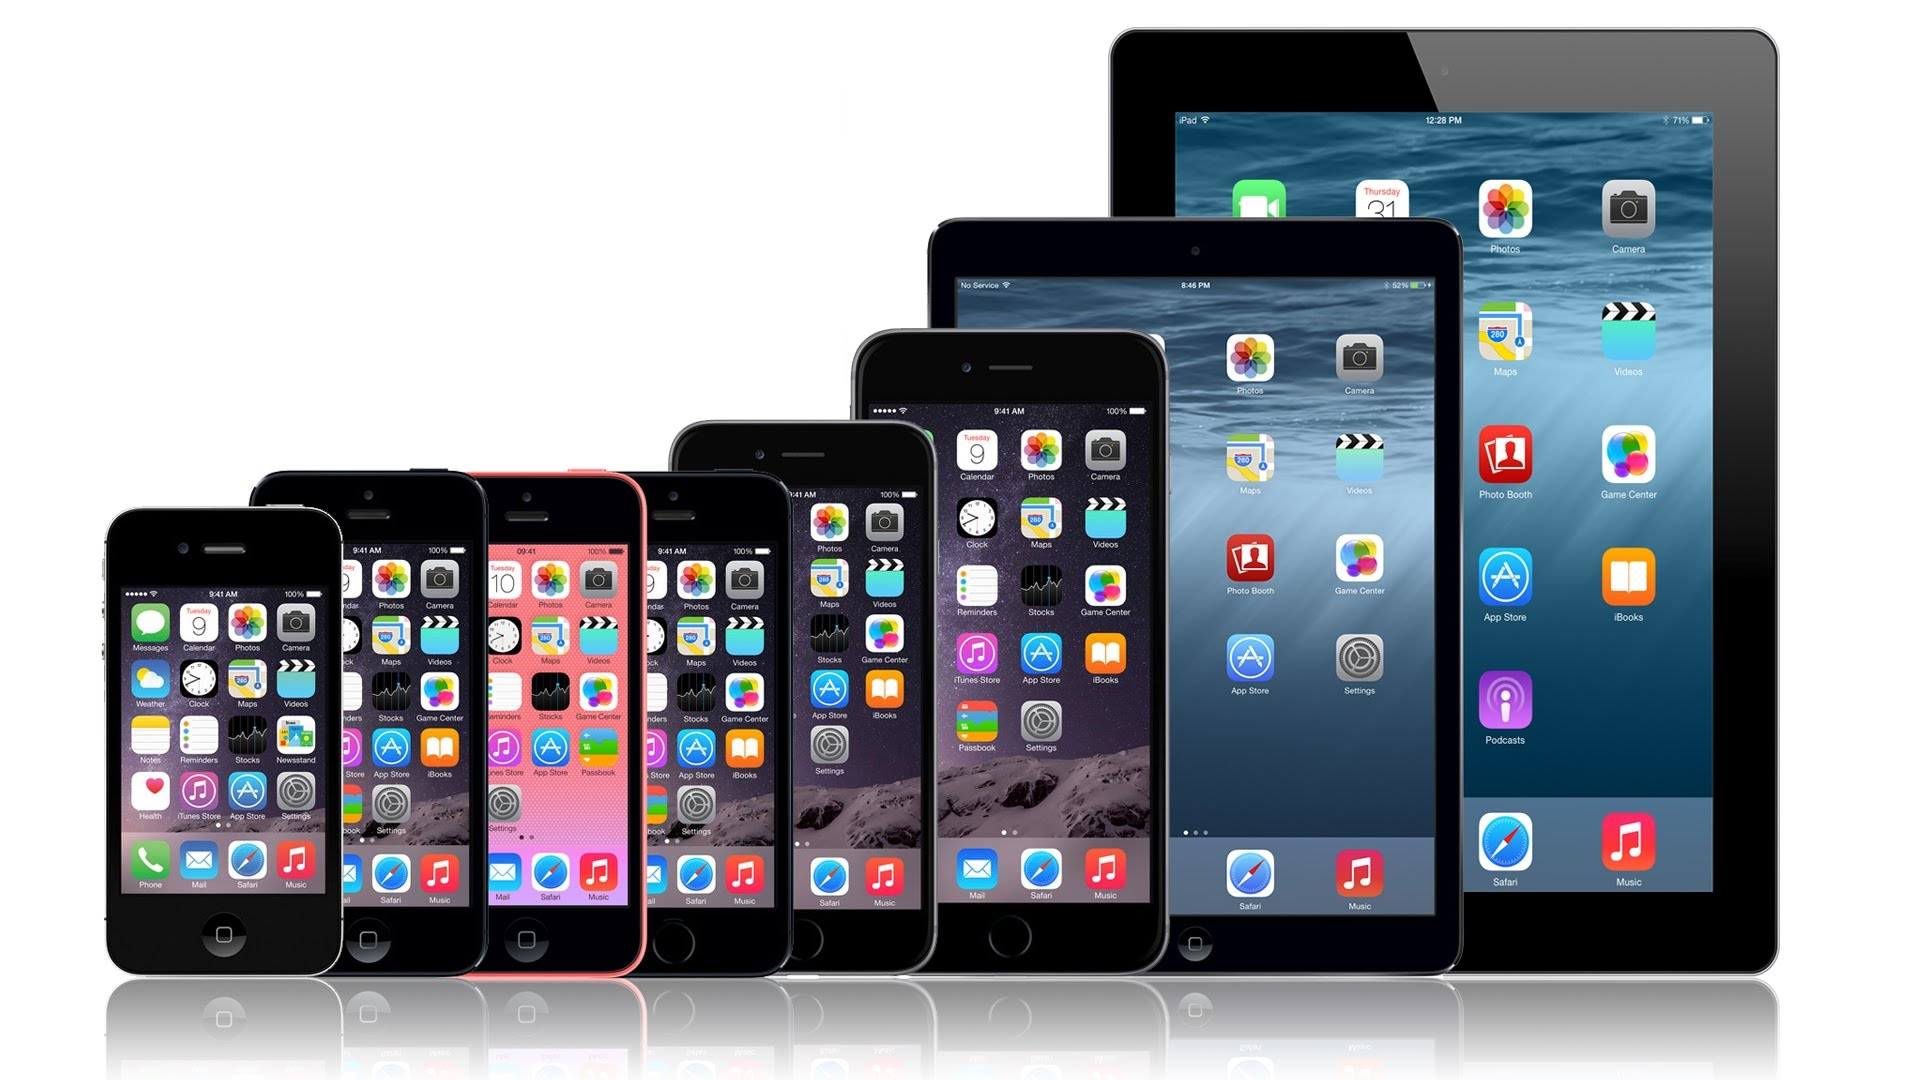 разблокировка apple id activation lock найти айфон